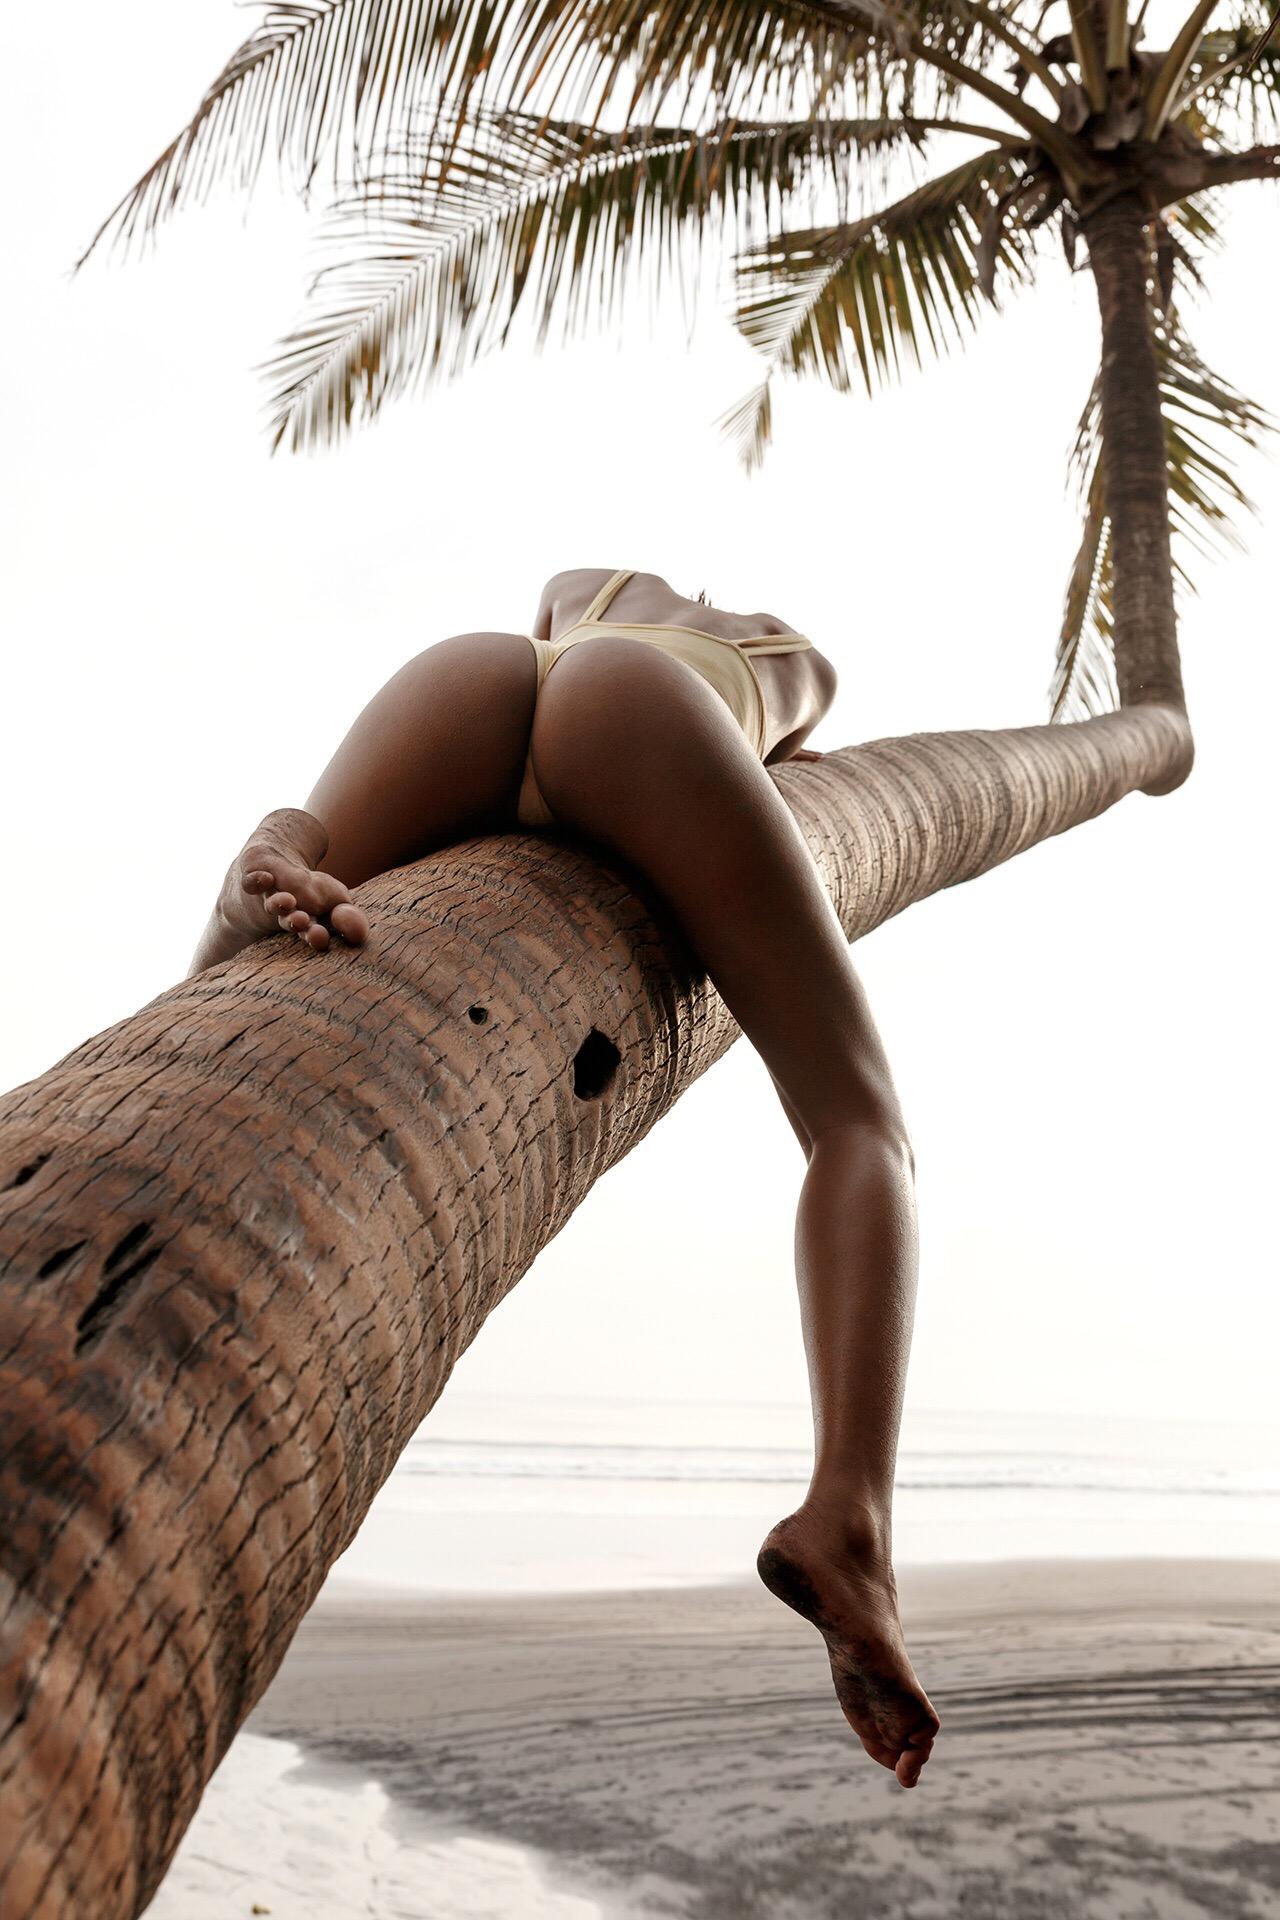 1280x1920, 463 Kb / Пальма, море, ноги, пляж, попа, Lydia Rose